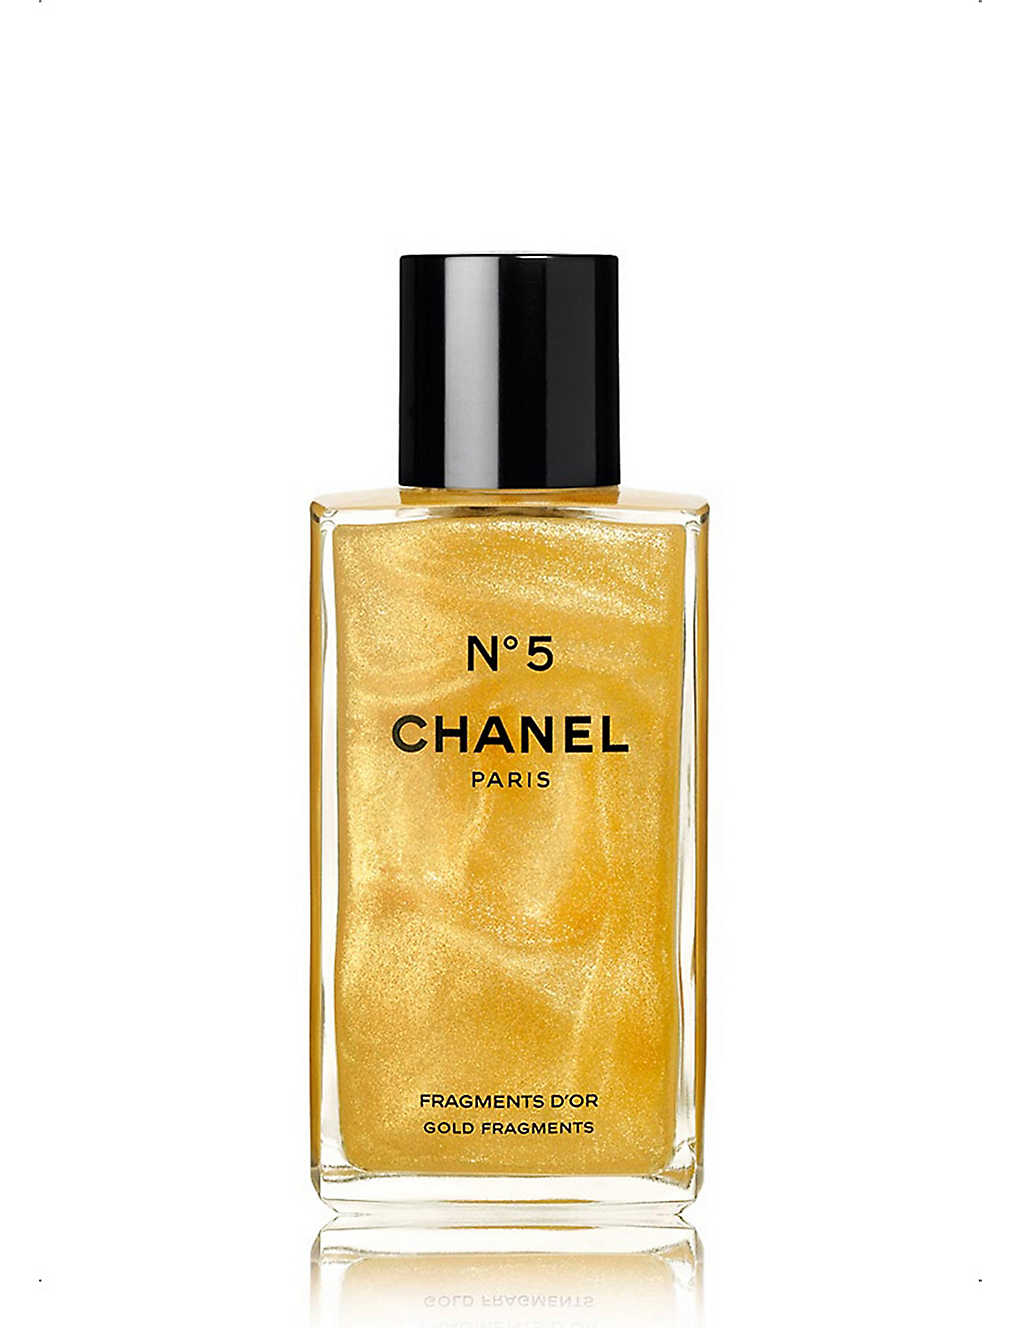 Chanel N5 Fragments Dor 250ml Selfridgescom